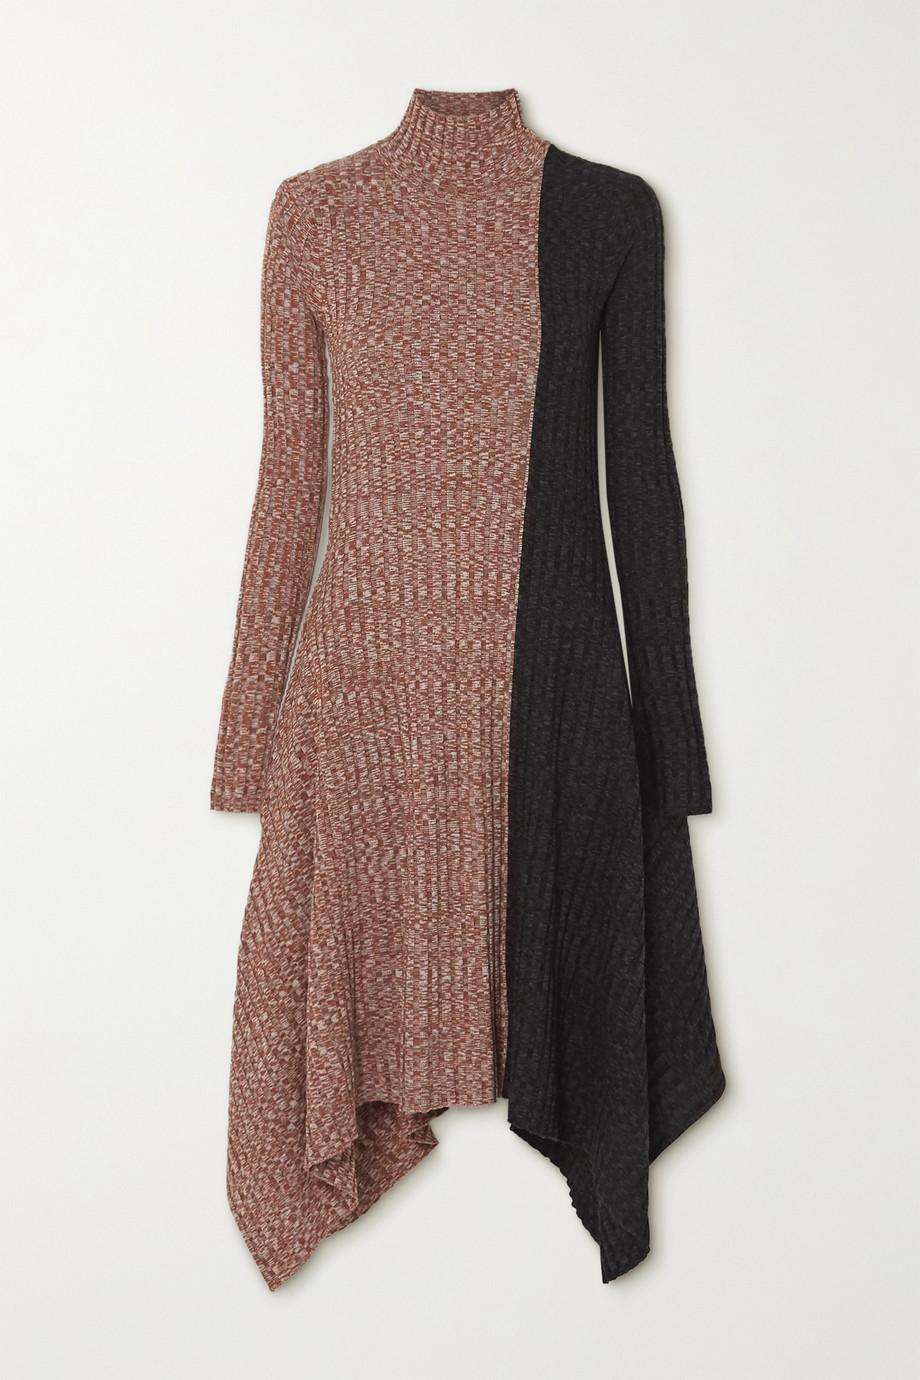 JW Anderson Asymmetric two-tone mélange merino wool turtleneck dress